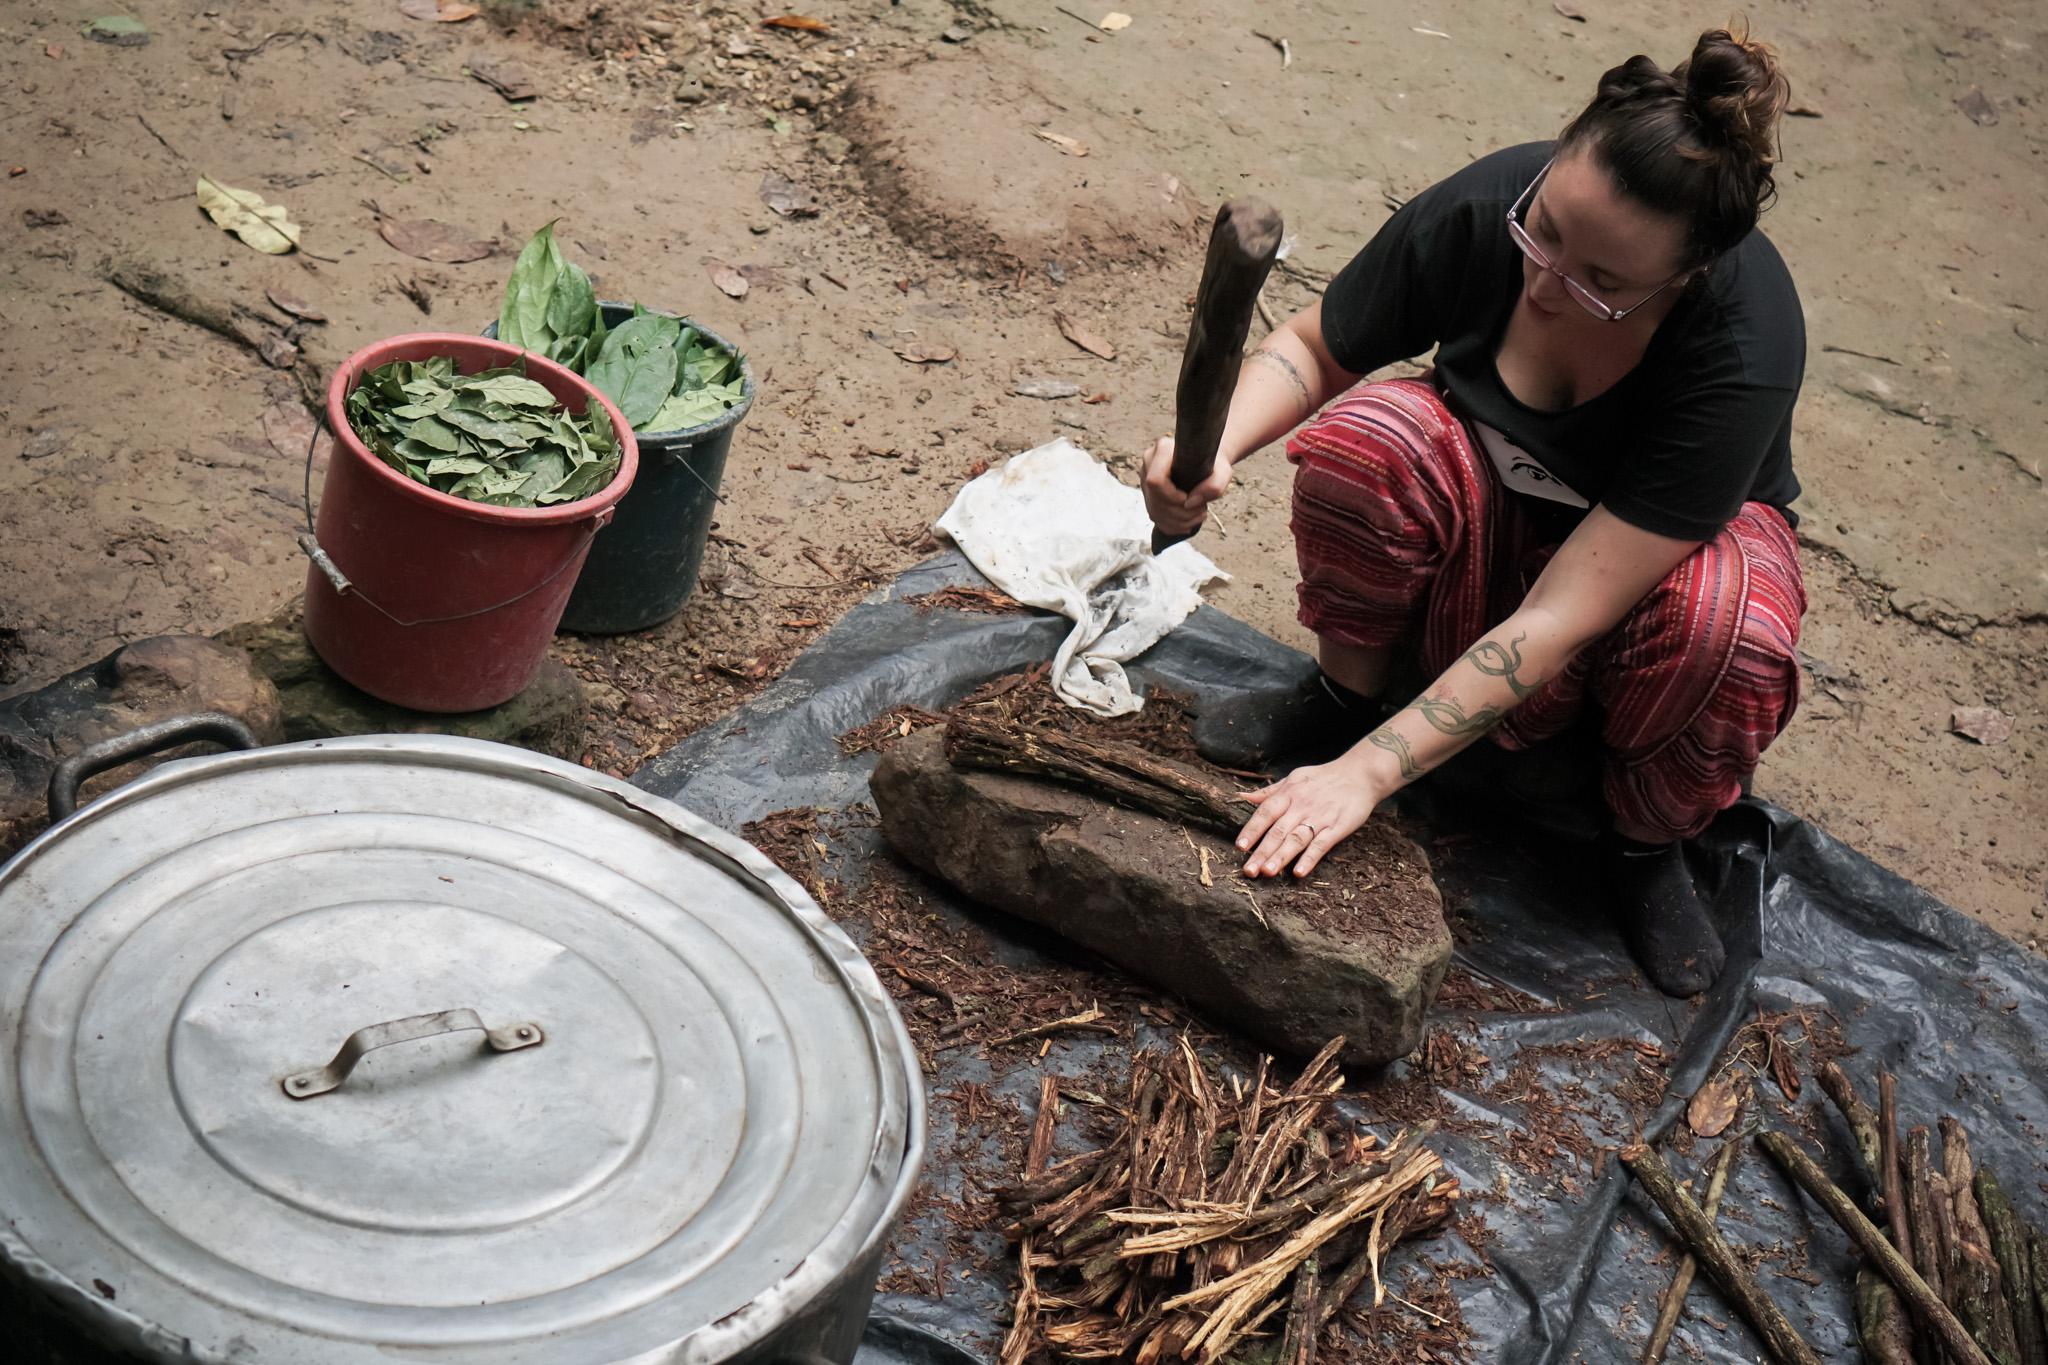 Šamaani õpilane Peruus ayahuasca't valmistamas. Foto: Terje Toomistu